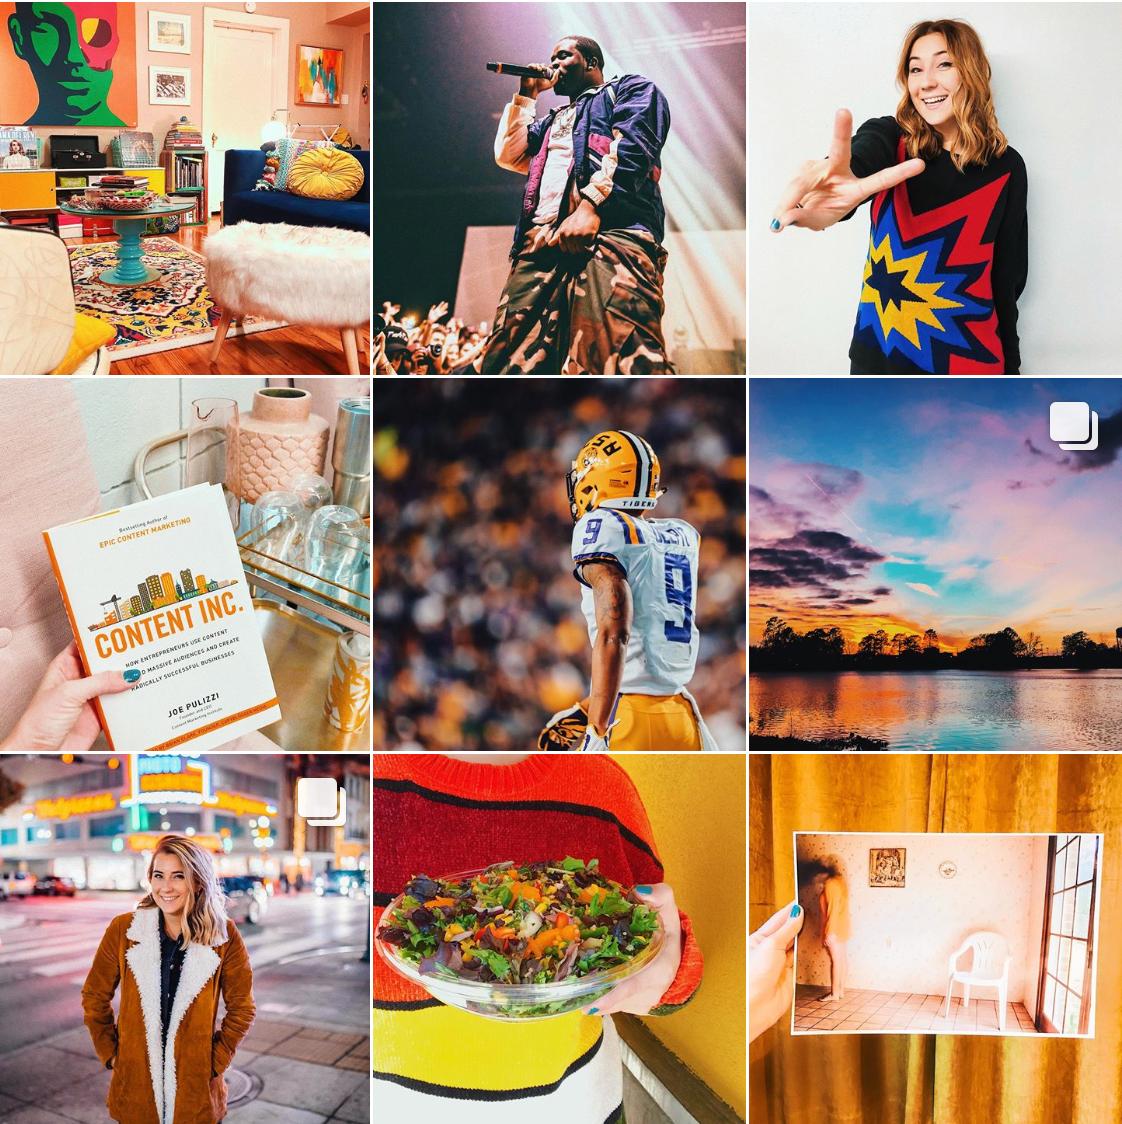 Jordan Hefler's Instagram Feed